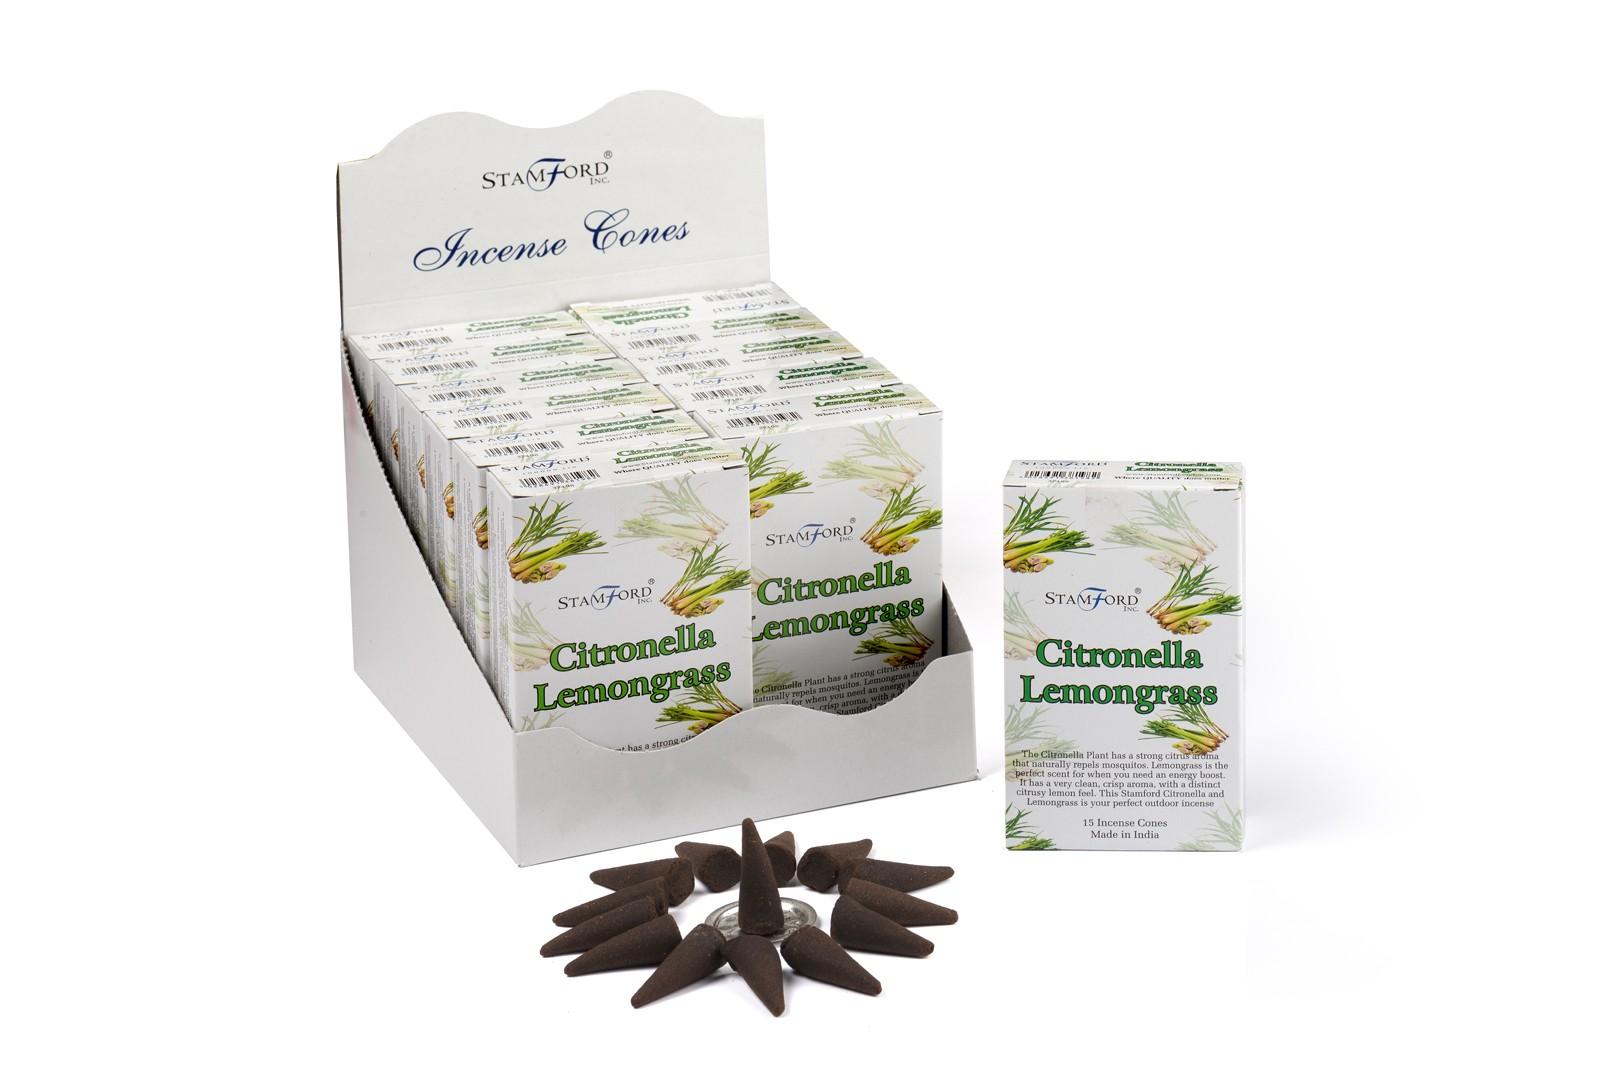 Citronella and Lemongrass Incense Cones